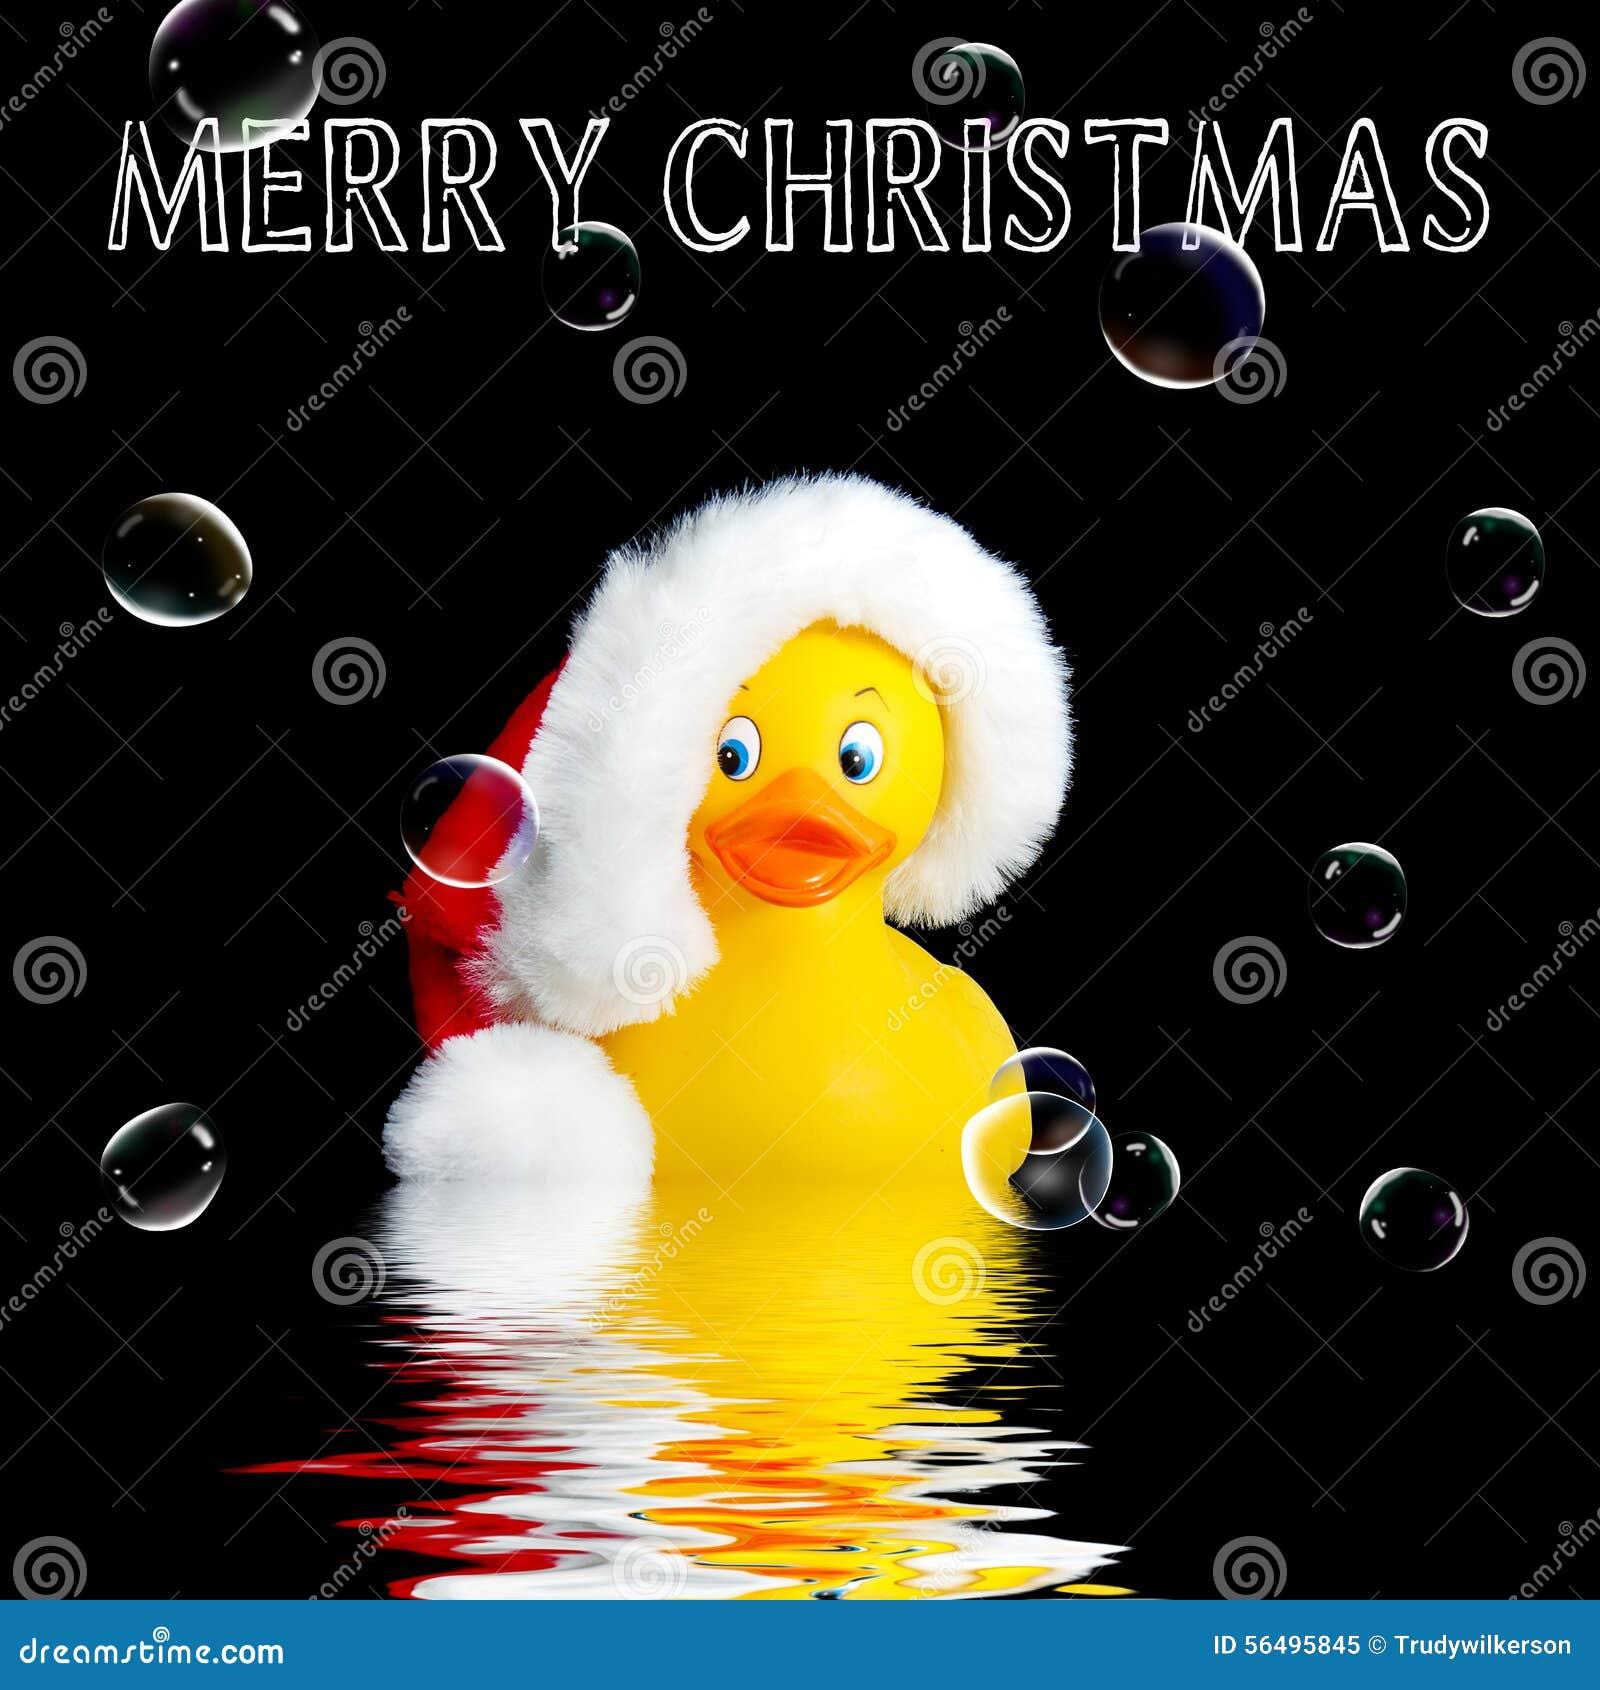 santa rubber duck christmas background - Christmas Duck